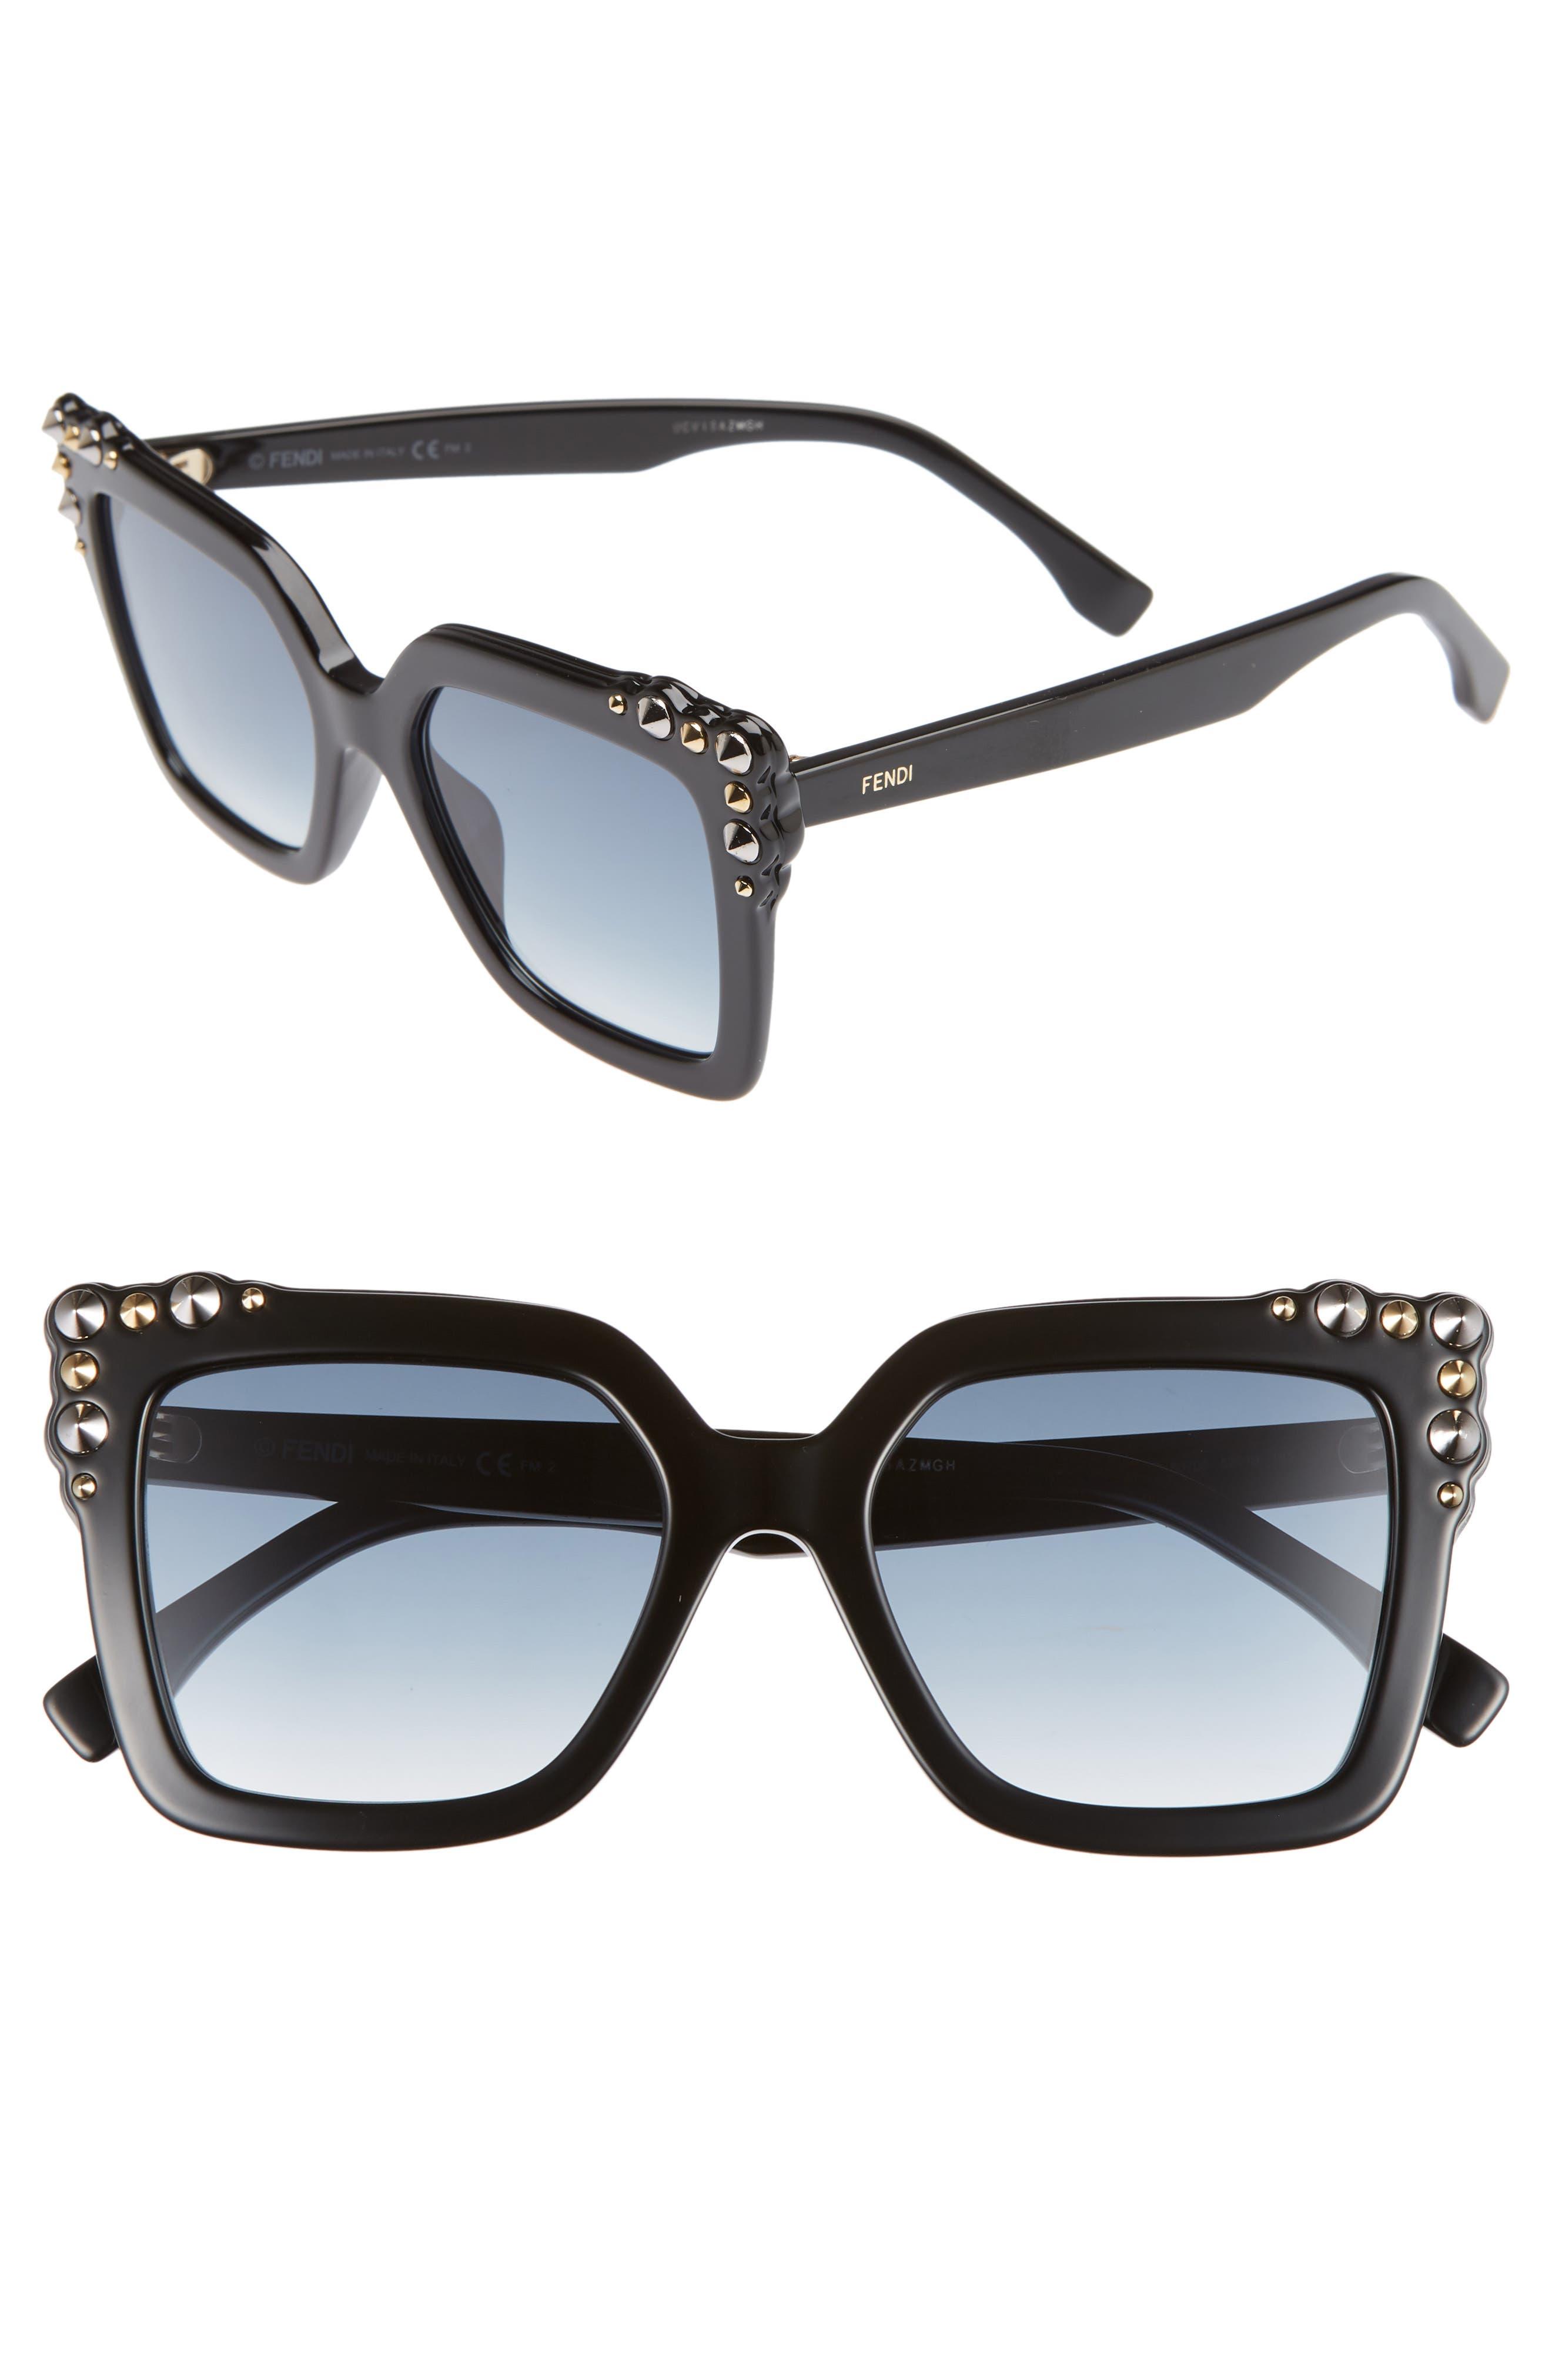 52mm Gradient Cat Eye Sunglasses,                             Main thumbnail 1, color,                             002